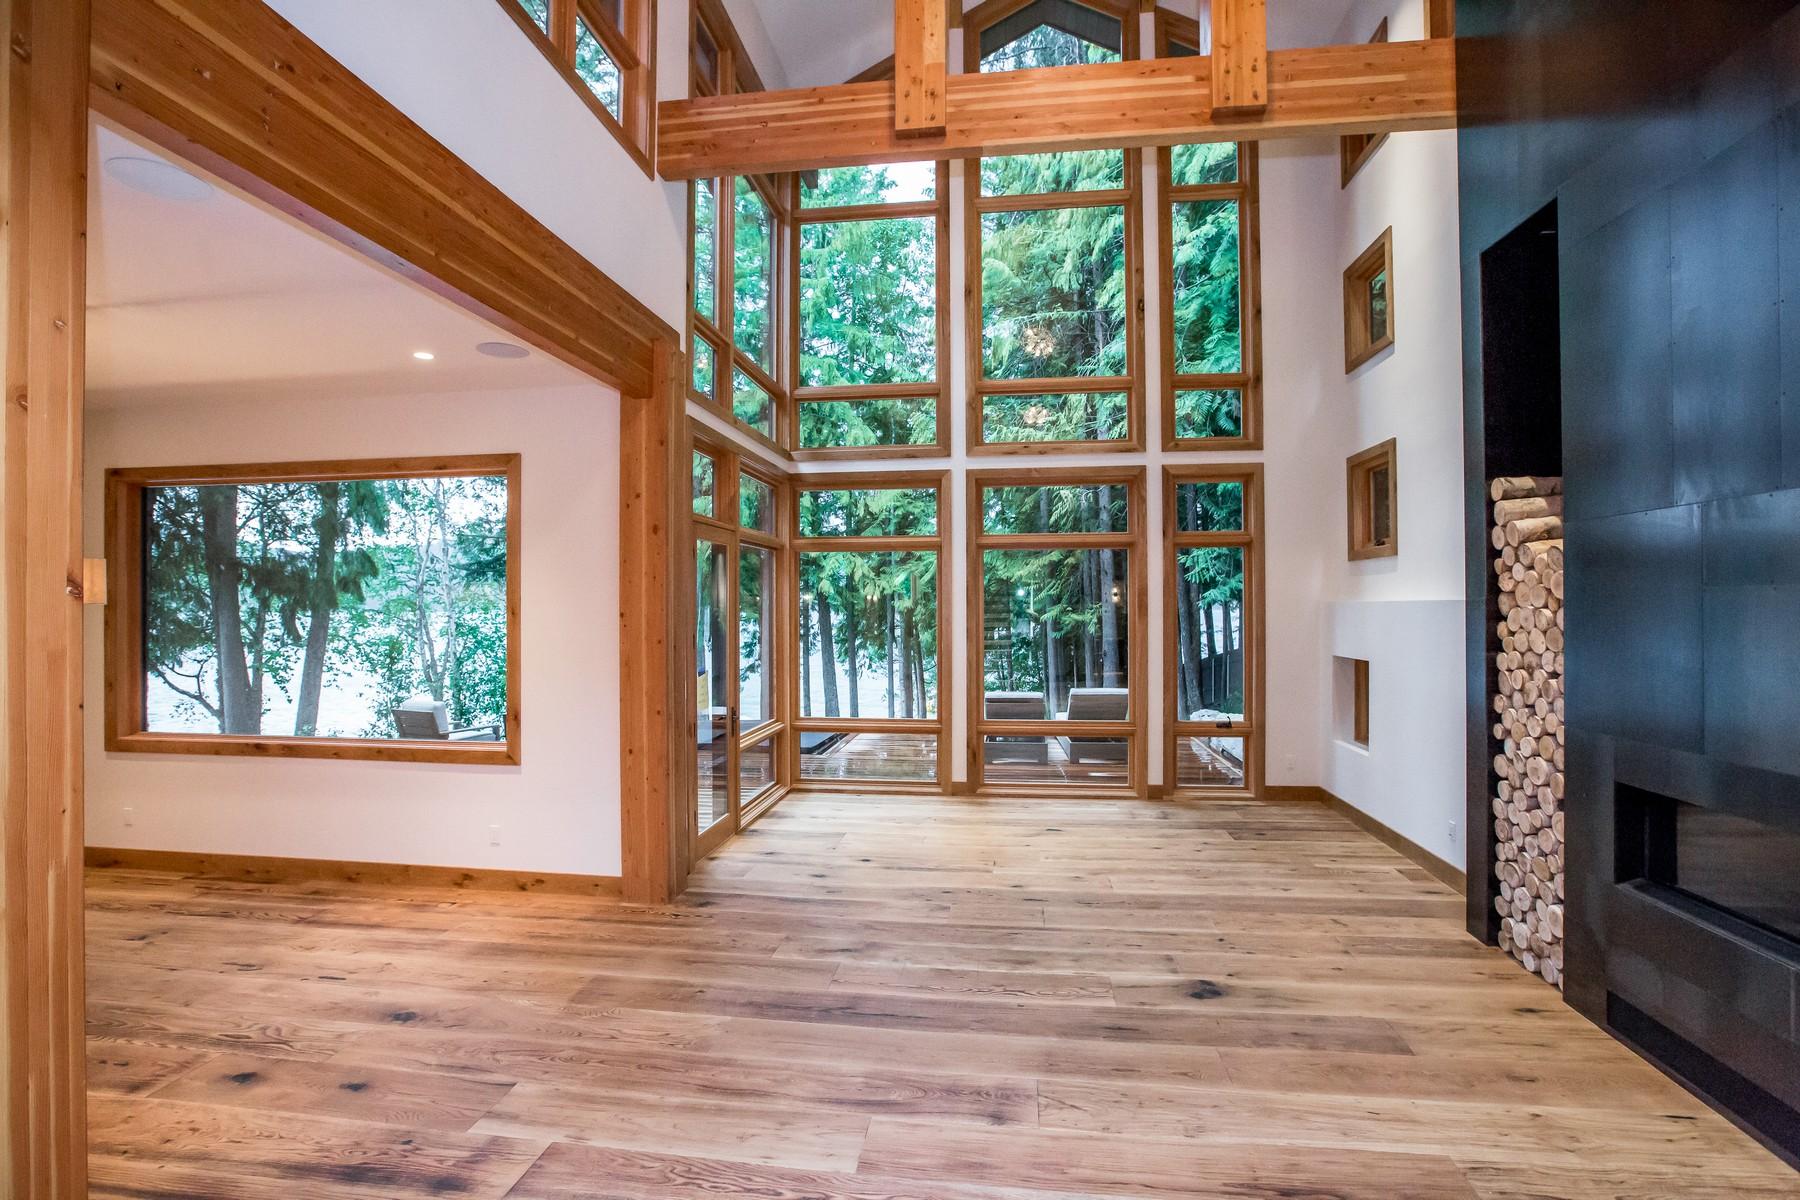 Additional photo for property listing at 2532 E Lakeshore Dr , Whitefish, MT 59937  Whitefish, Montana 59937 United States